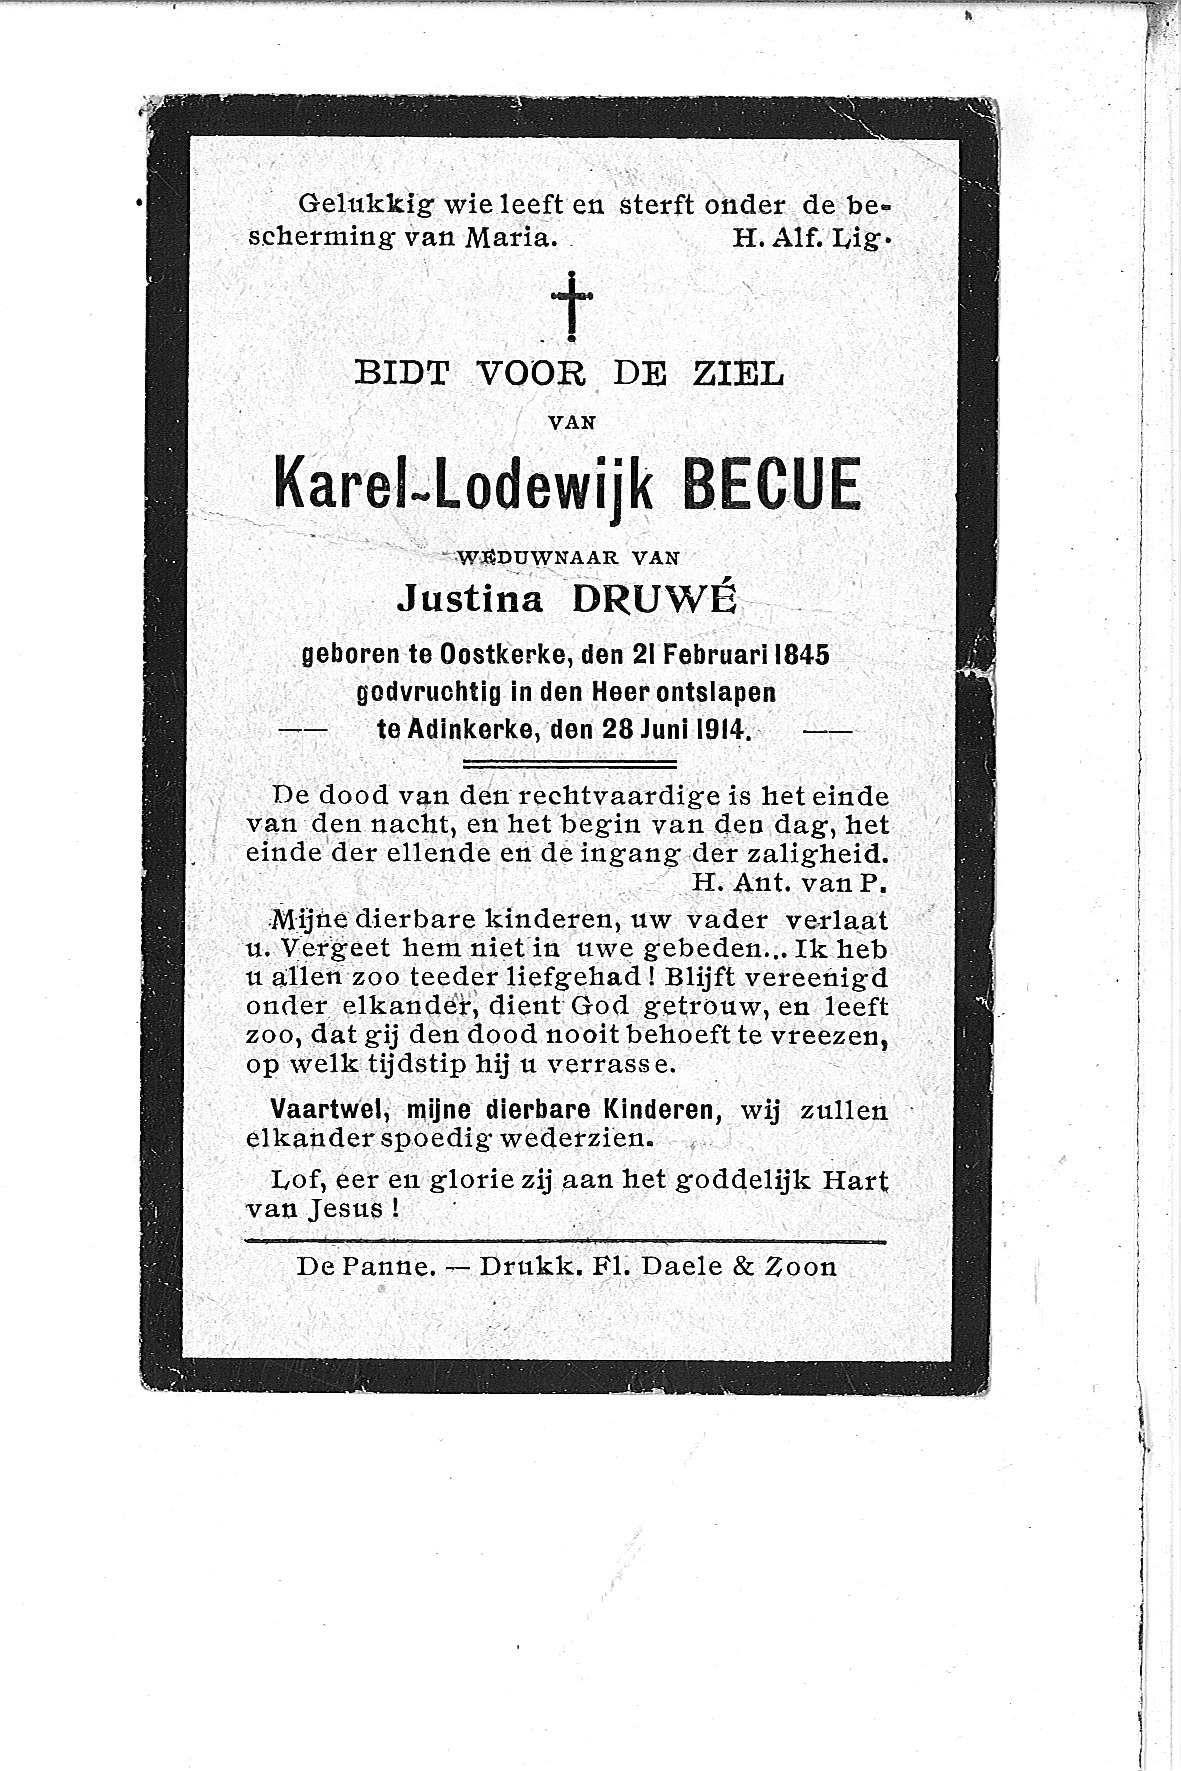 Karel-Lodewijk(1914)20101123120917_00043.jpg